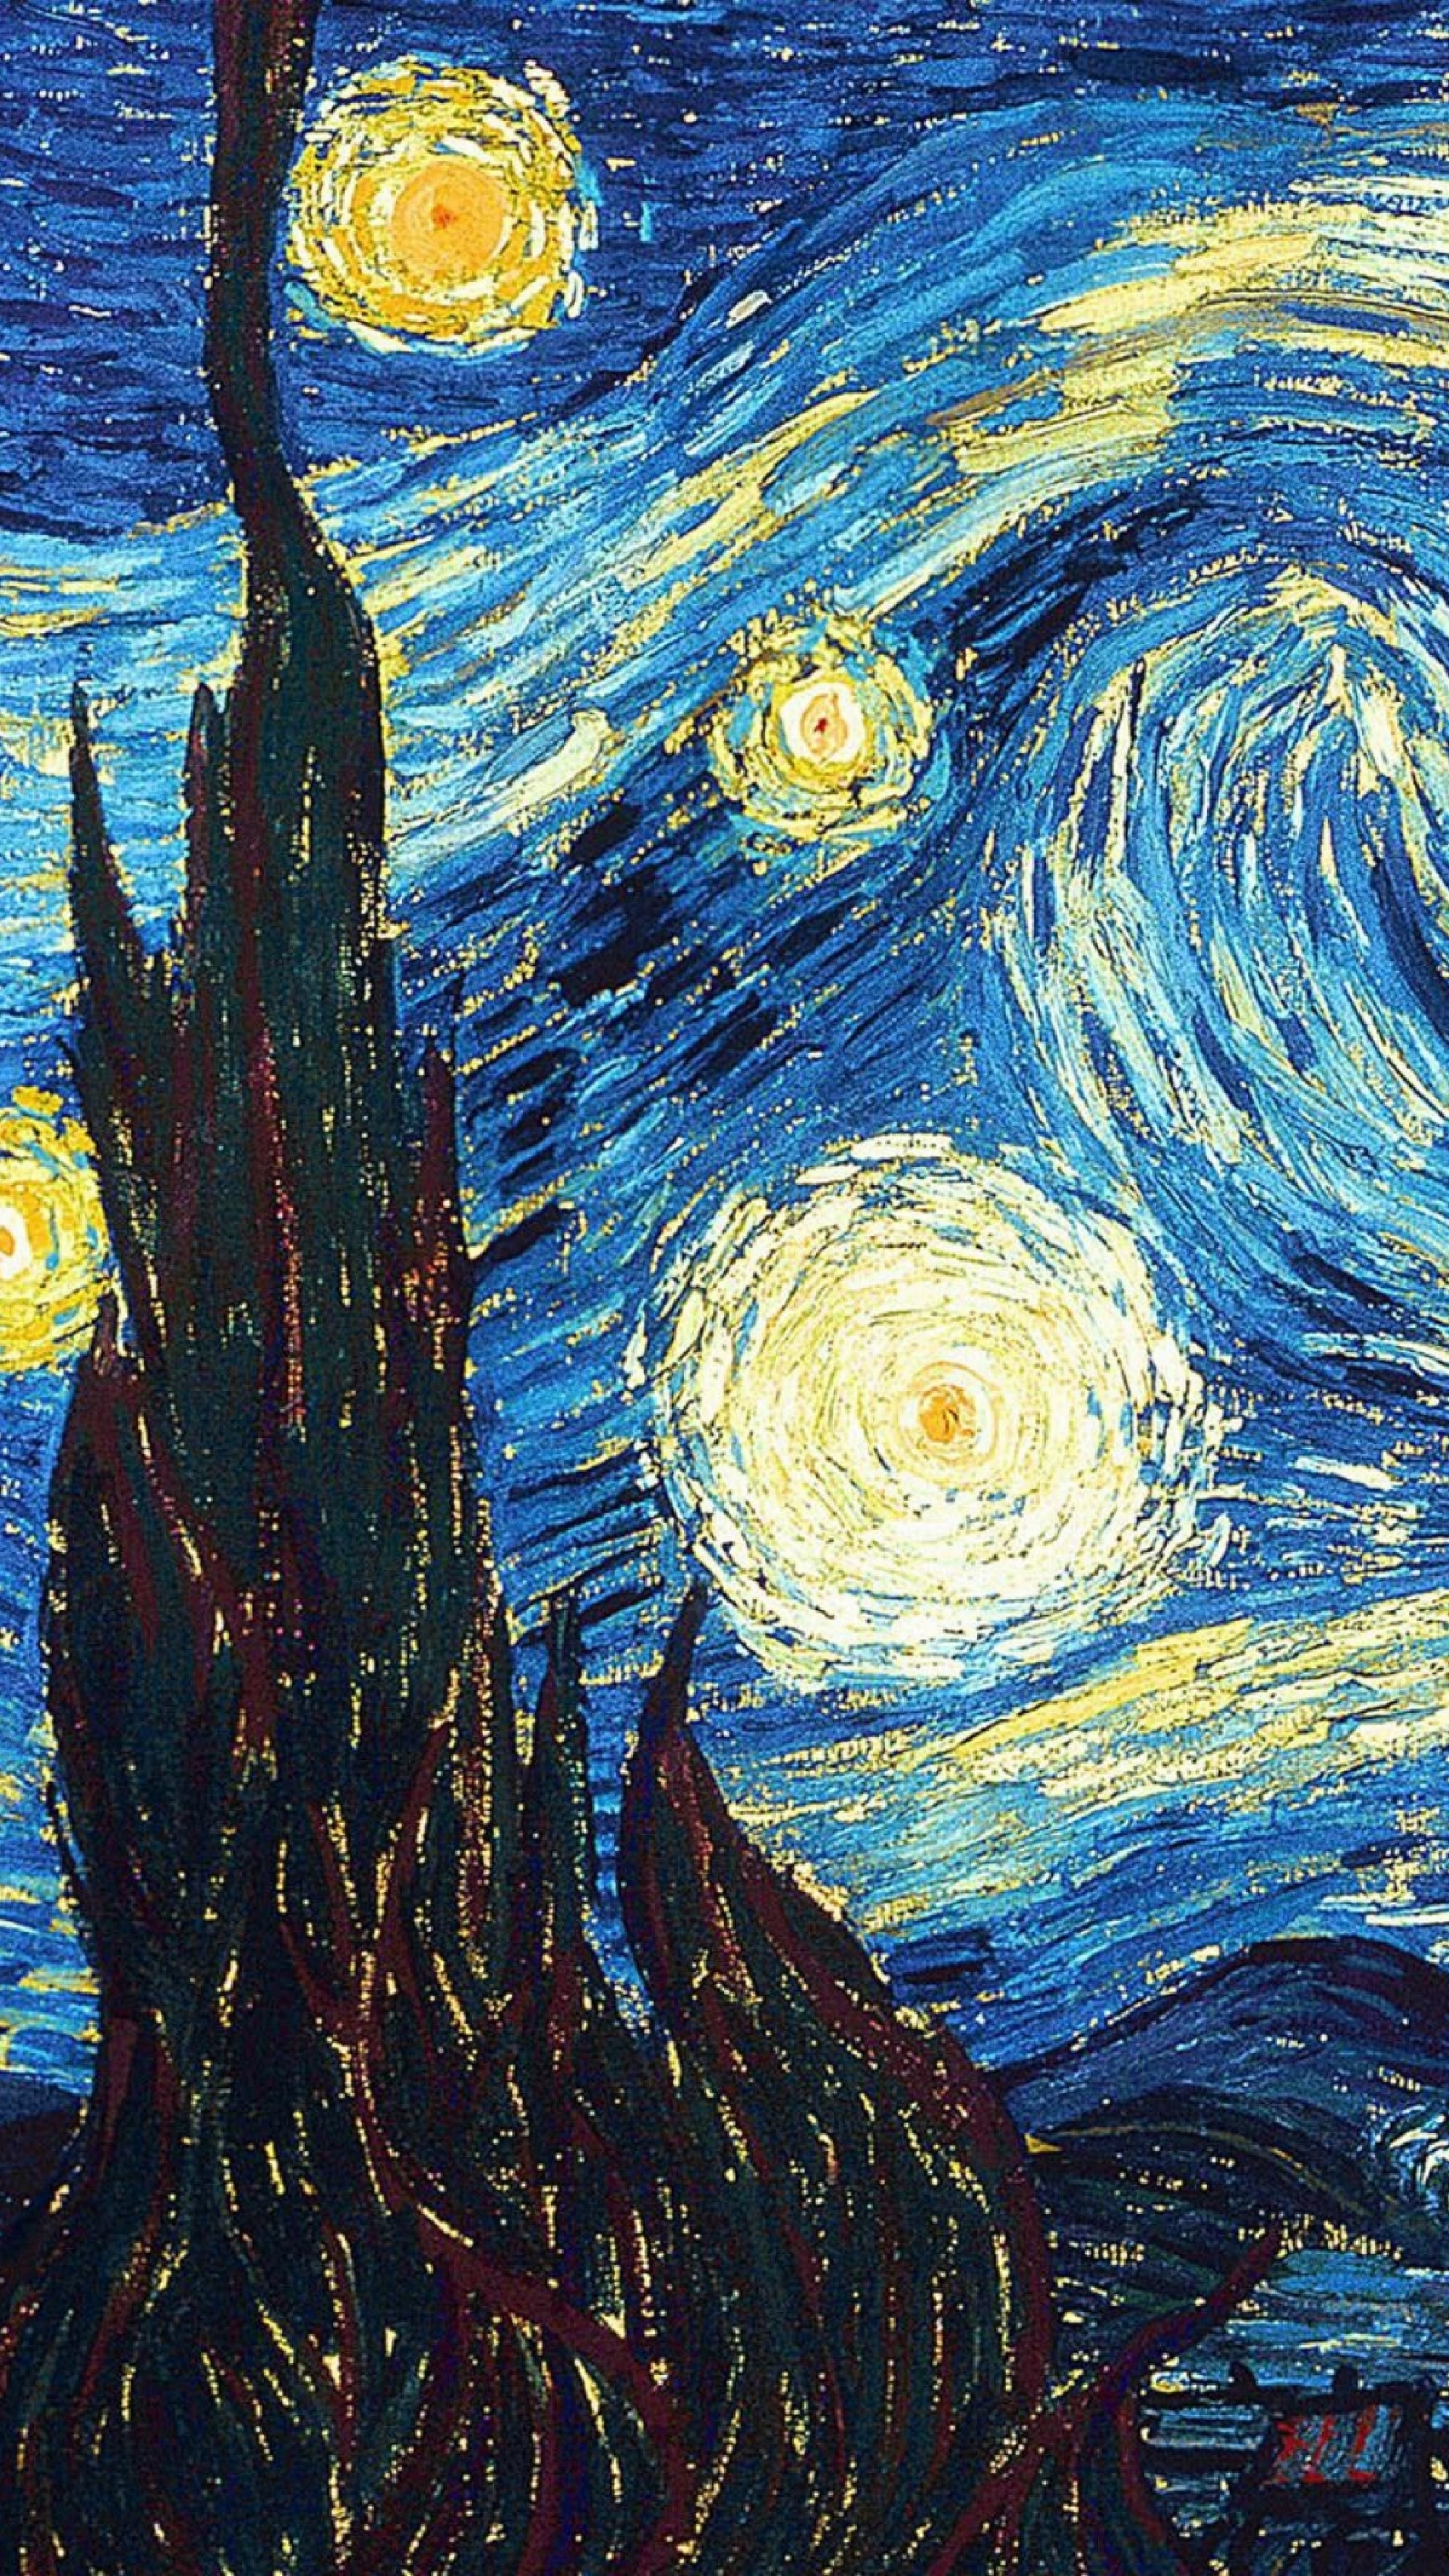 Starry night desktop background 67 images - Vincent van gogh wallpaper ...